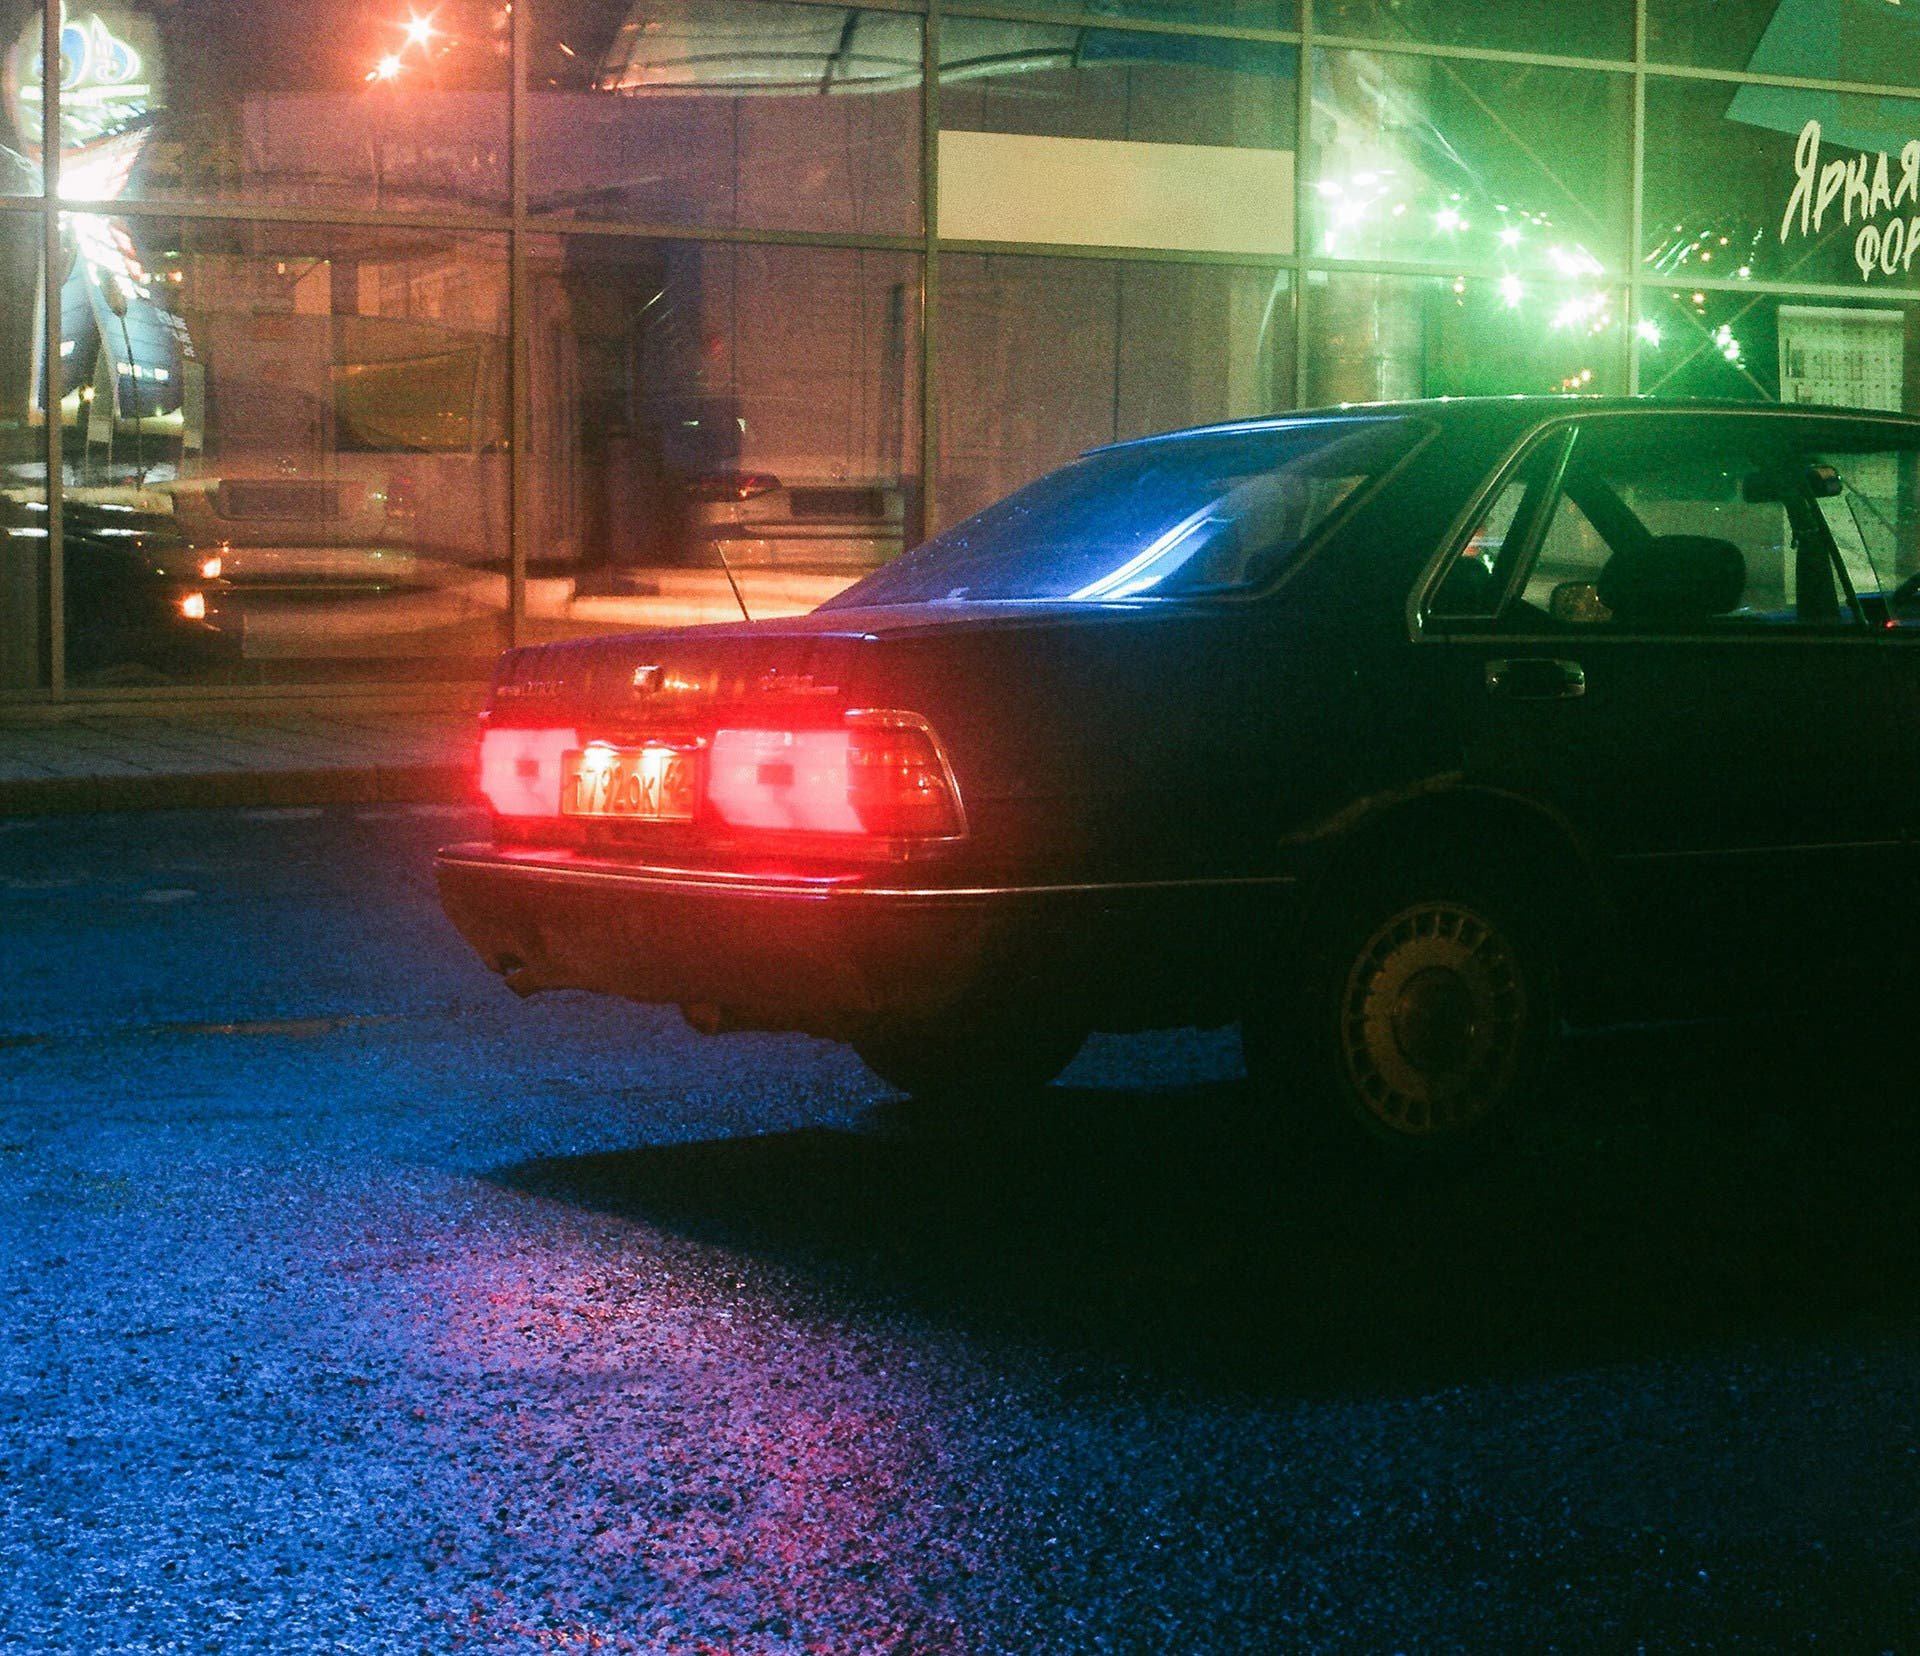 Vlad Tretiak: Nighttime Street Photography in Siberia Shot on Film